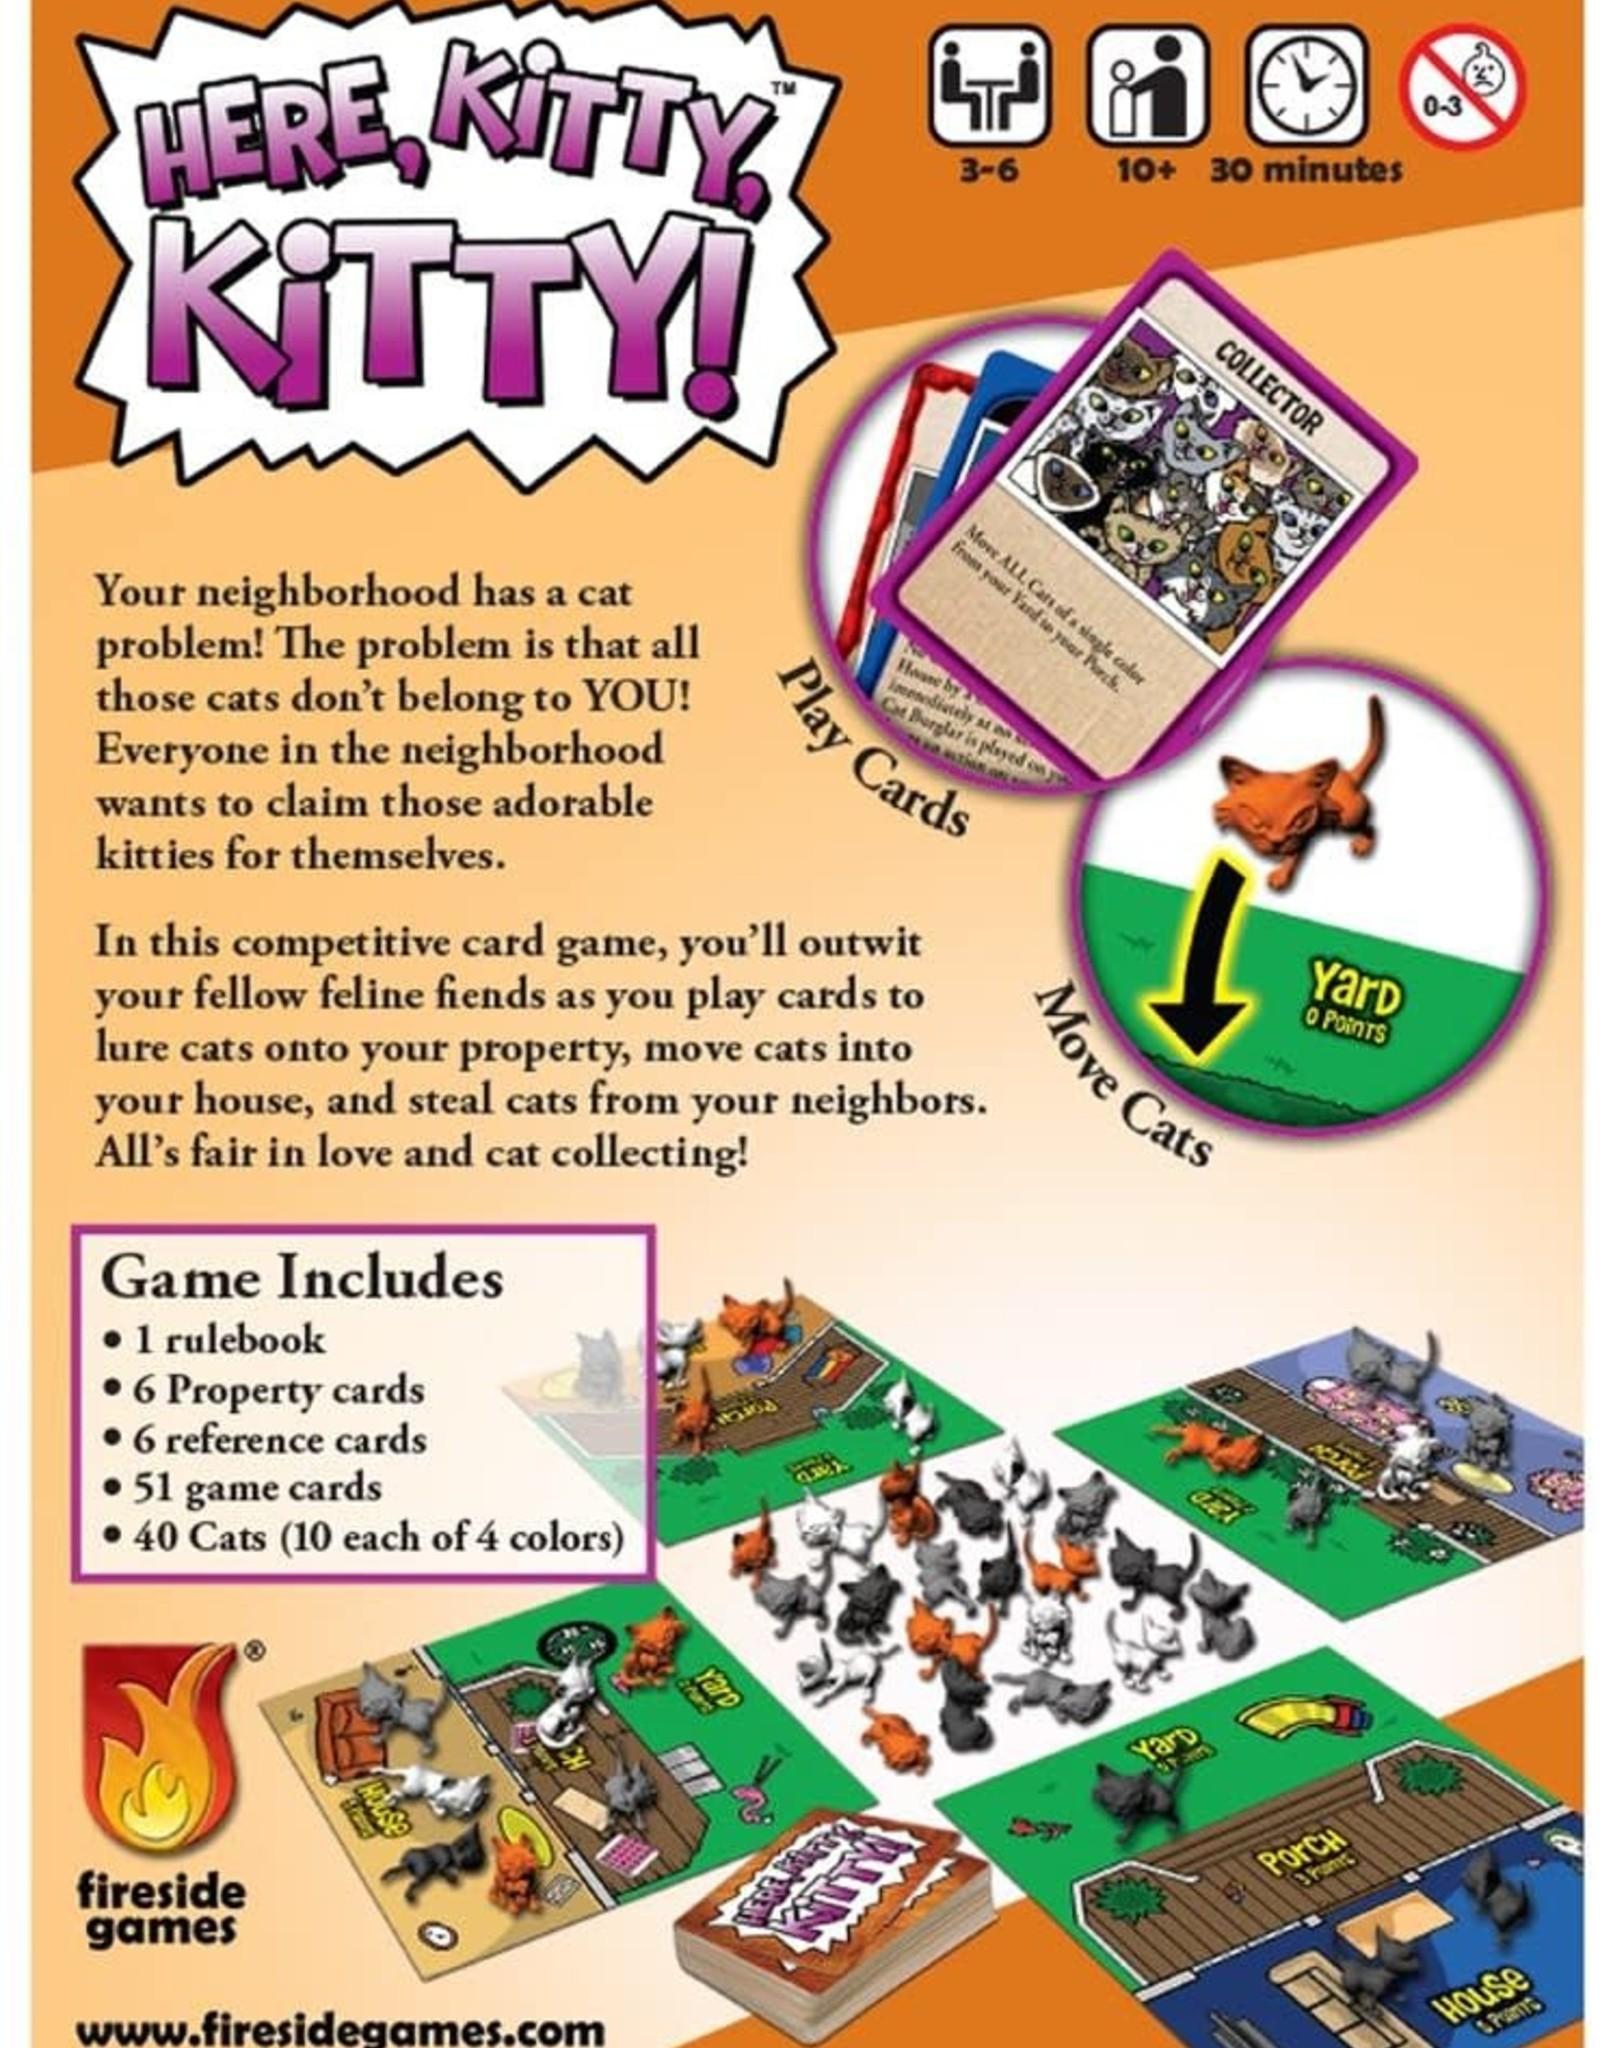 Fireside Games Here Kitty Kitty!